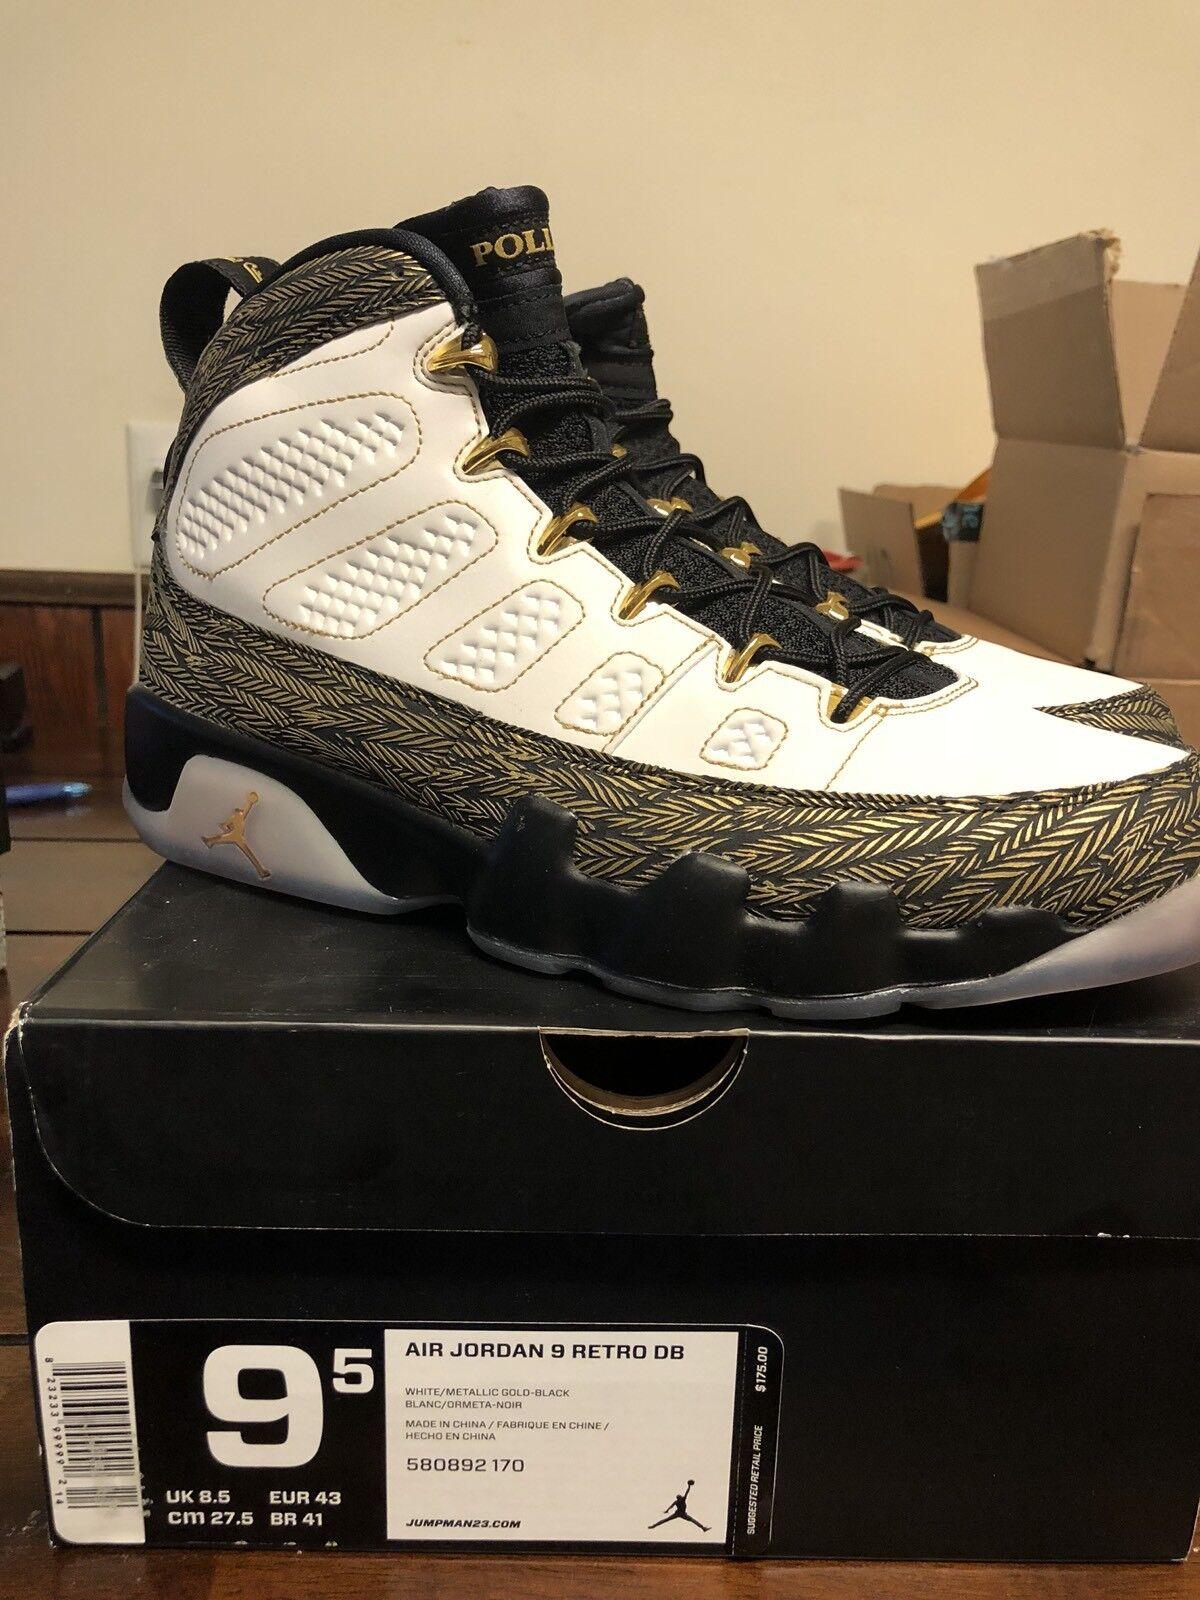 Nike Air Jordan IX 9 Retro DB Doernbecher 580892-170 Size 9.5 New Authentic